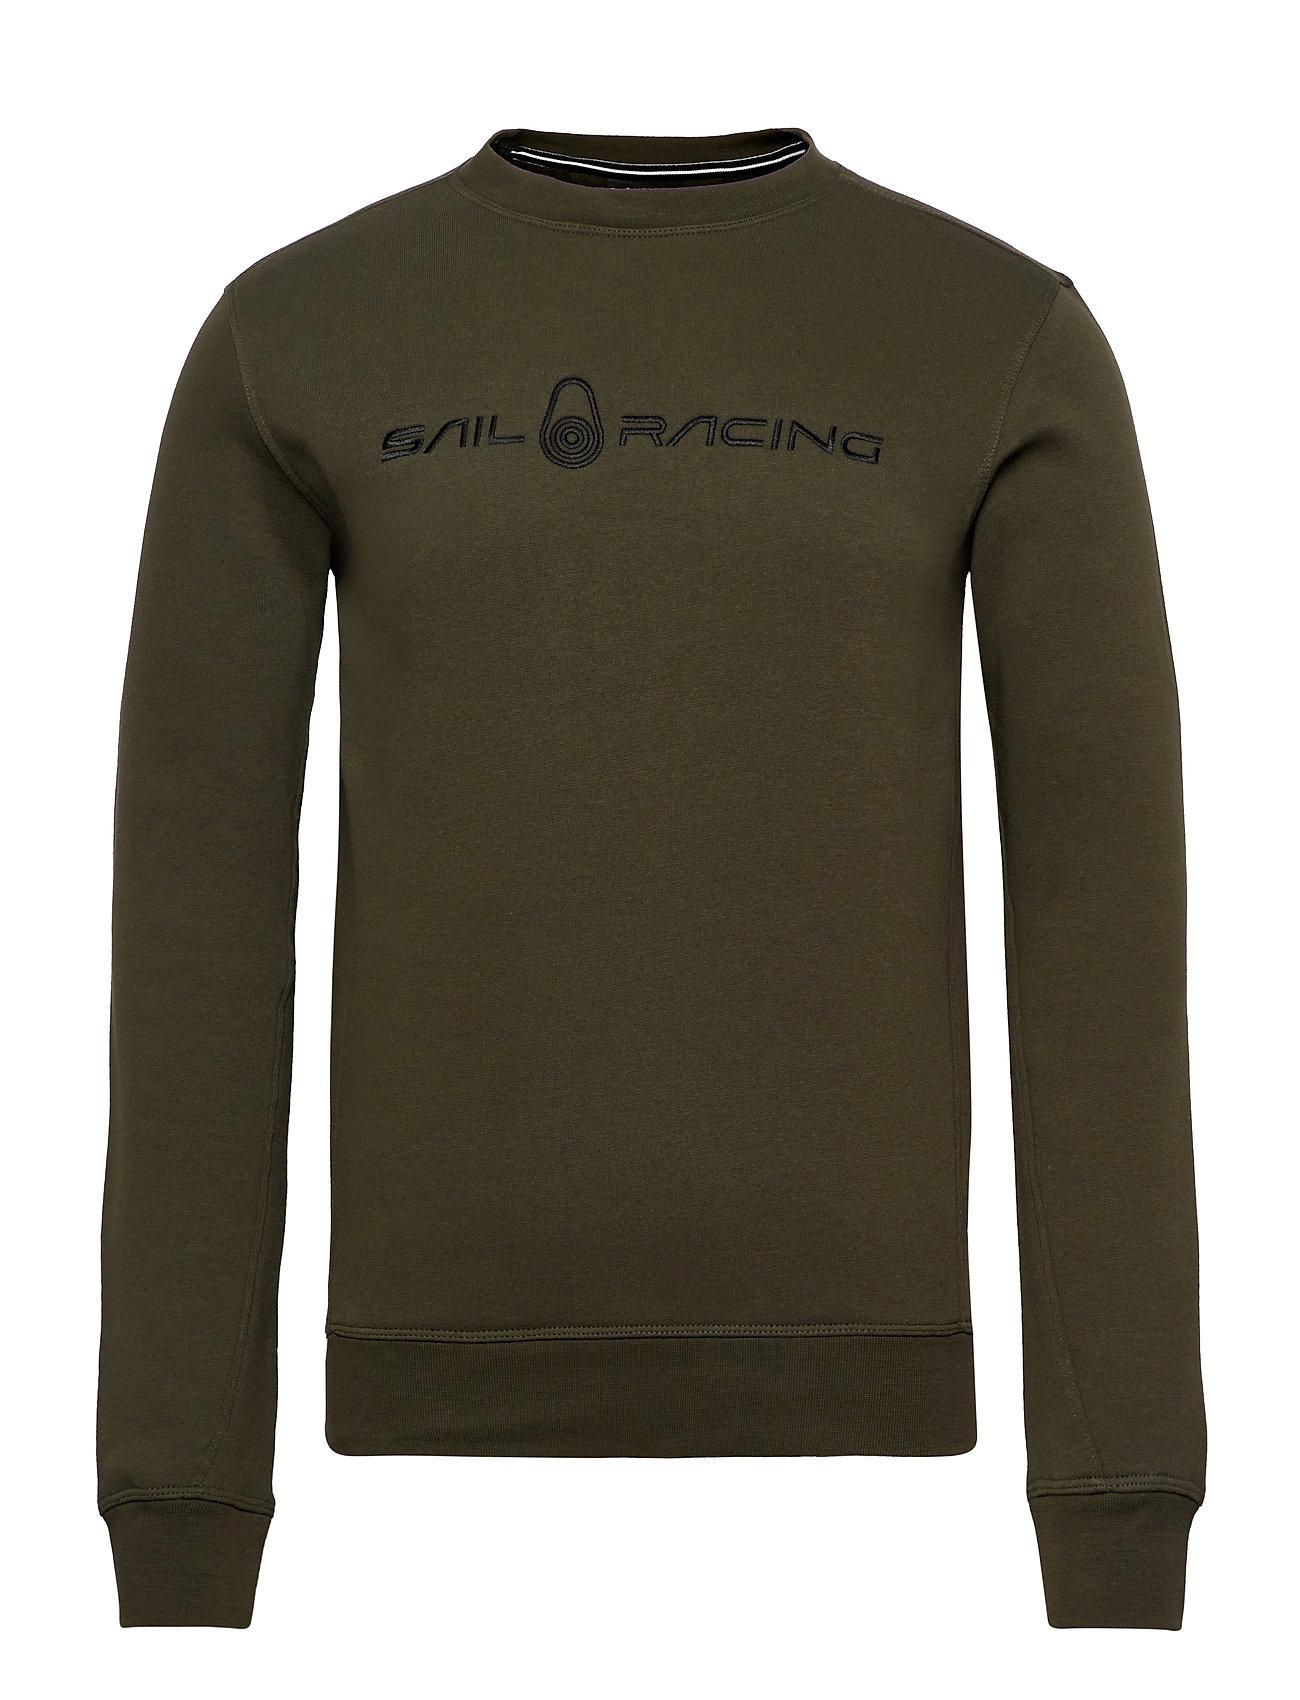 Bowman Sweater Sweatshirt Trøje Grøn Sail Racing